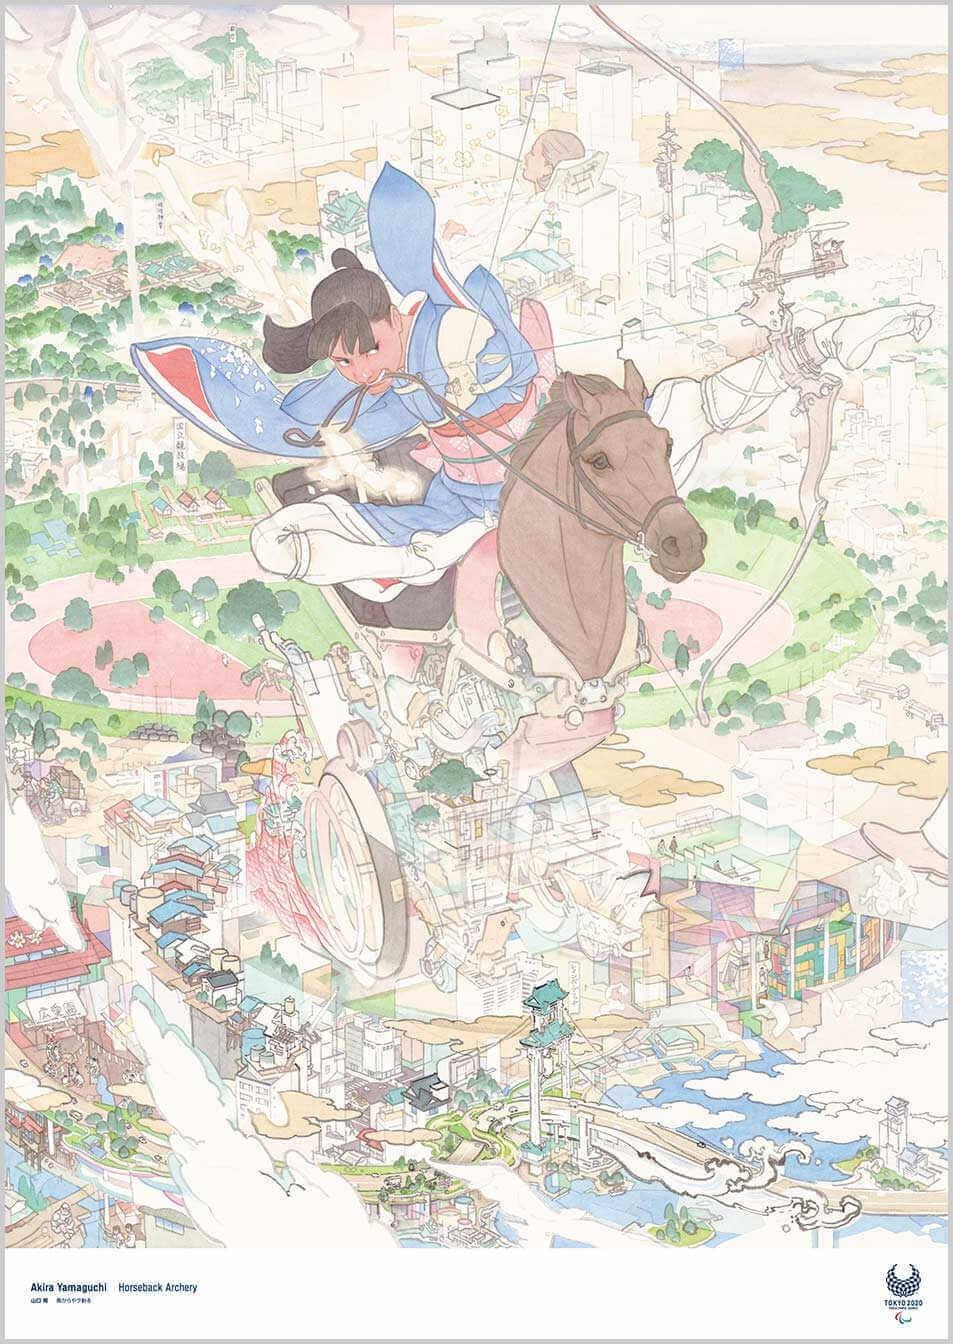 Cartel para las paraolimpiadas de tokio 202 creado por Akira Yamaguchi, mujer volando sobre un caballo